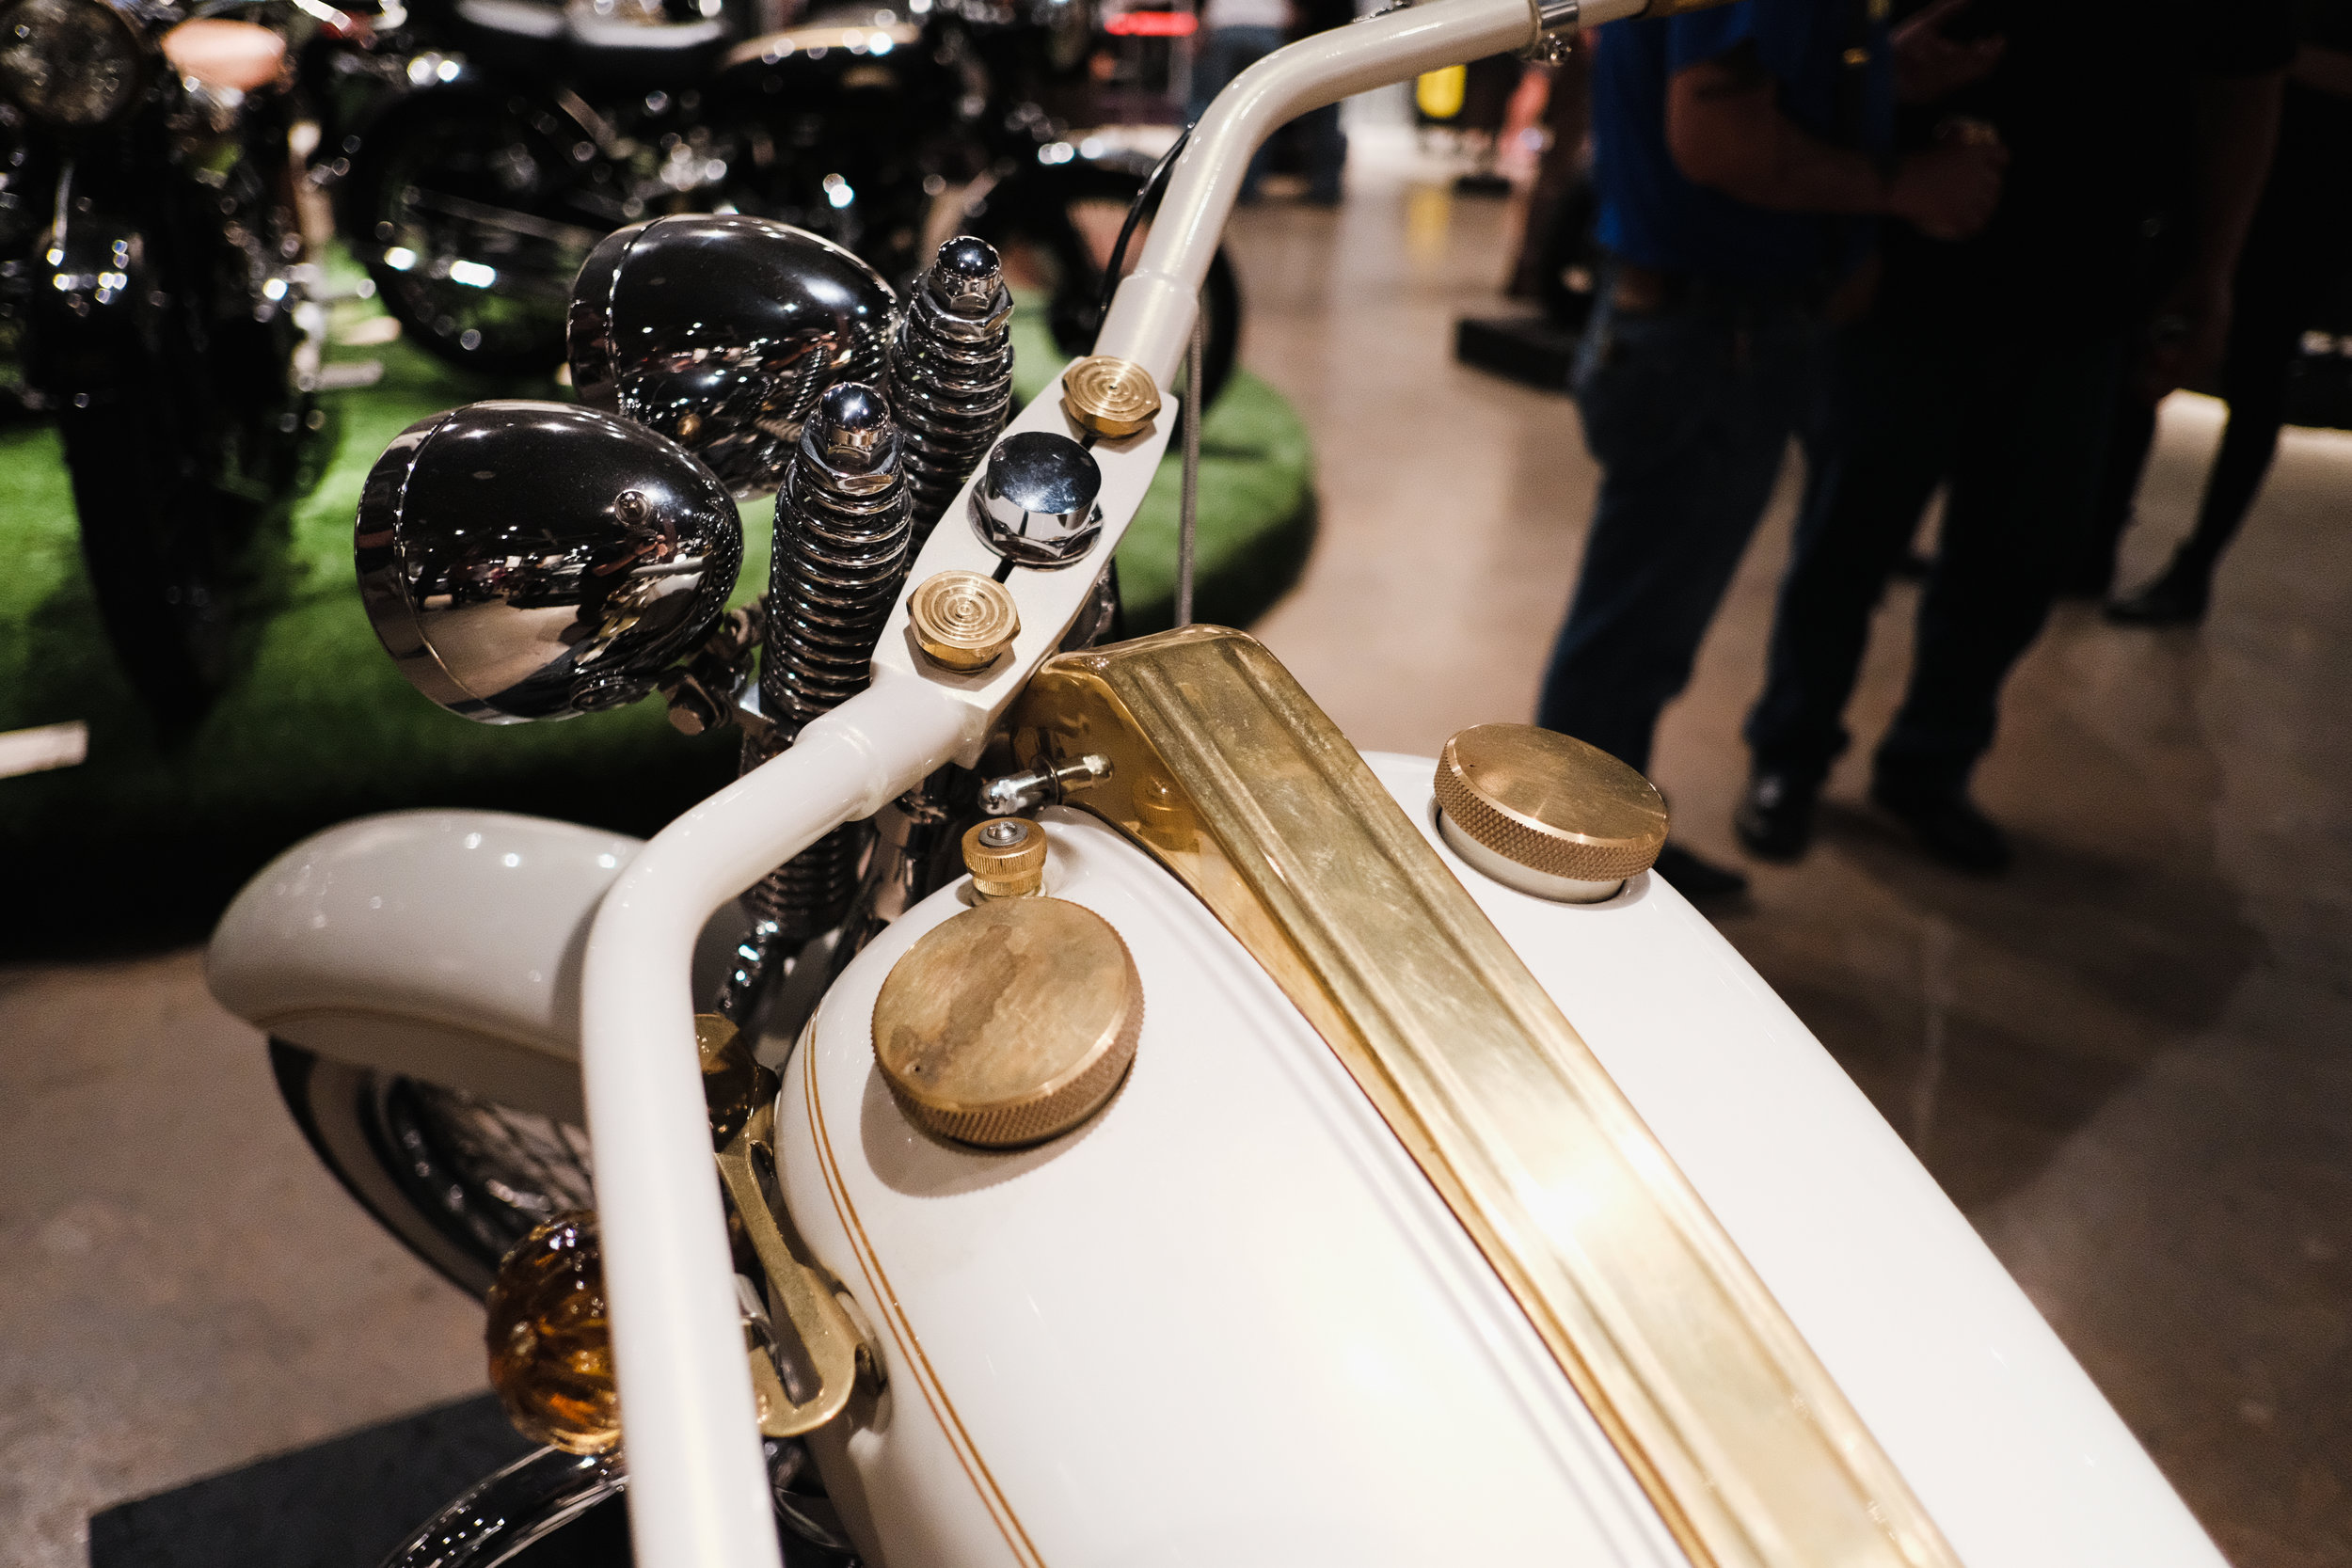 Handbuilt-Motorcycle-Show-2017-8545.jpg